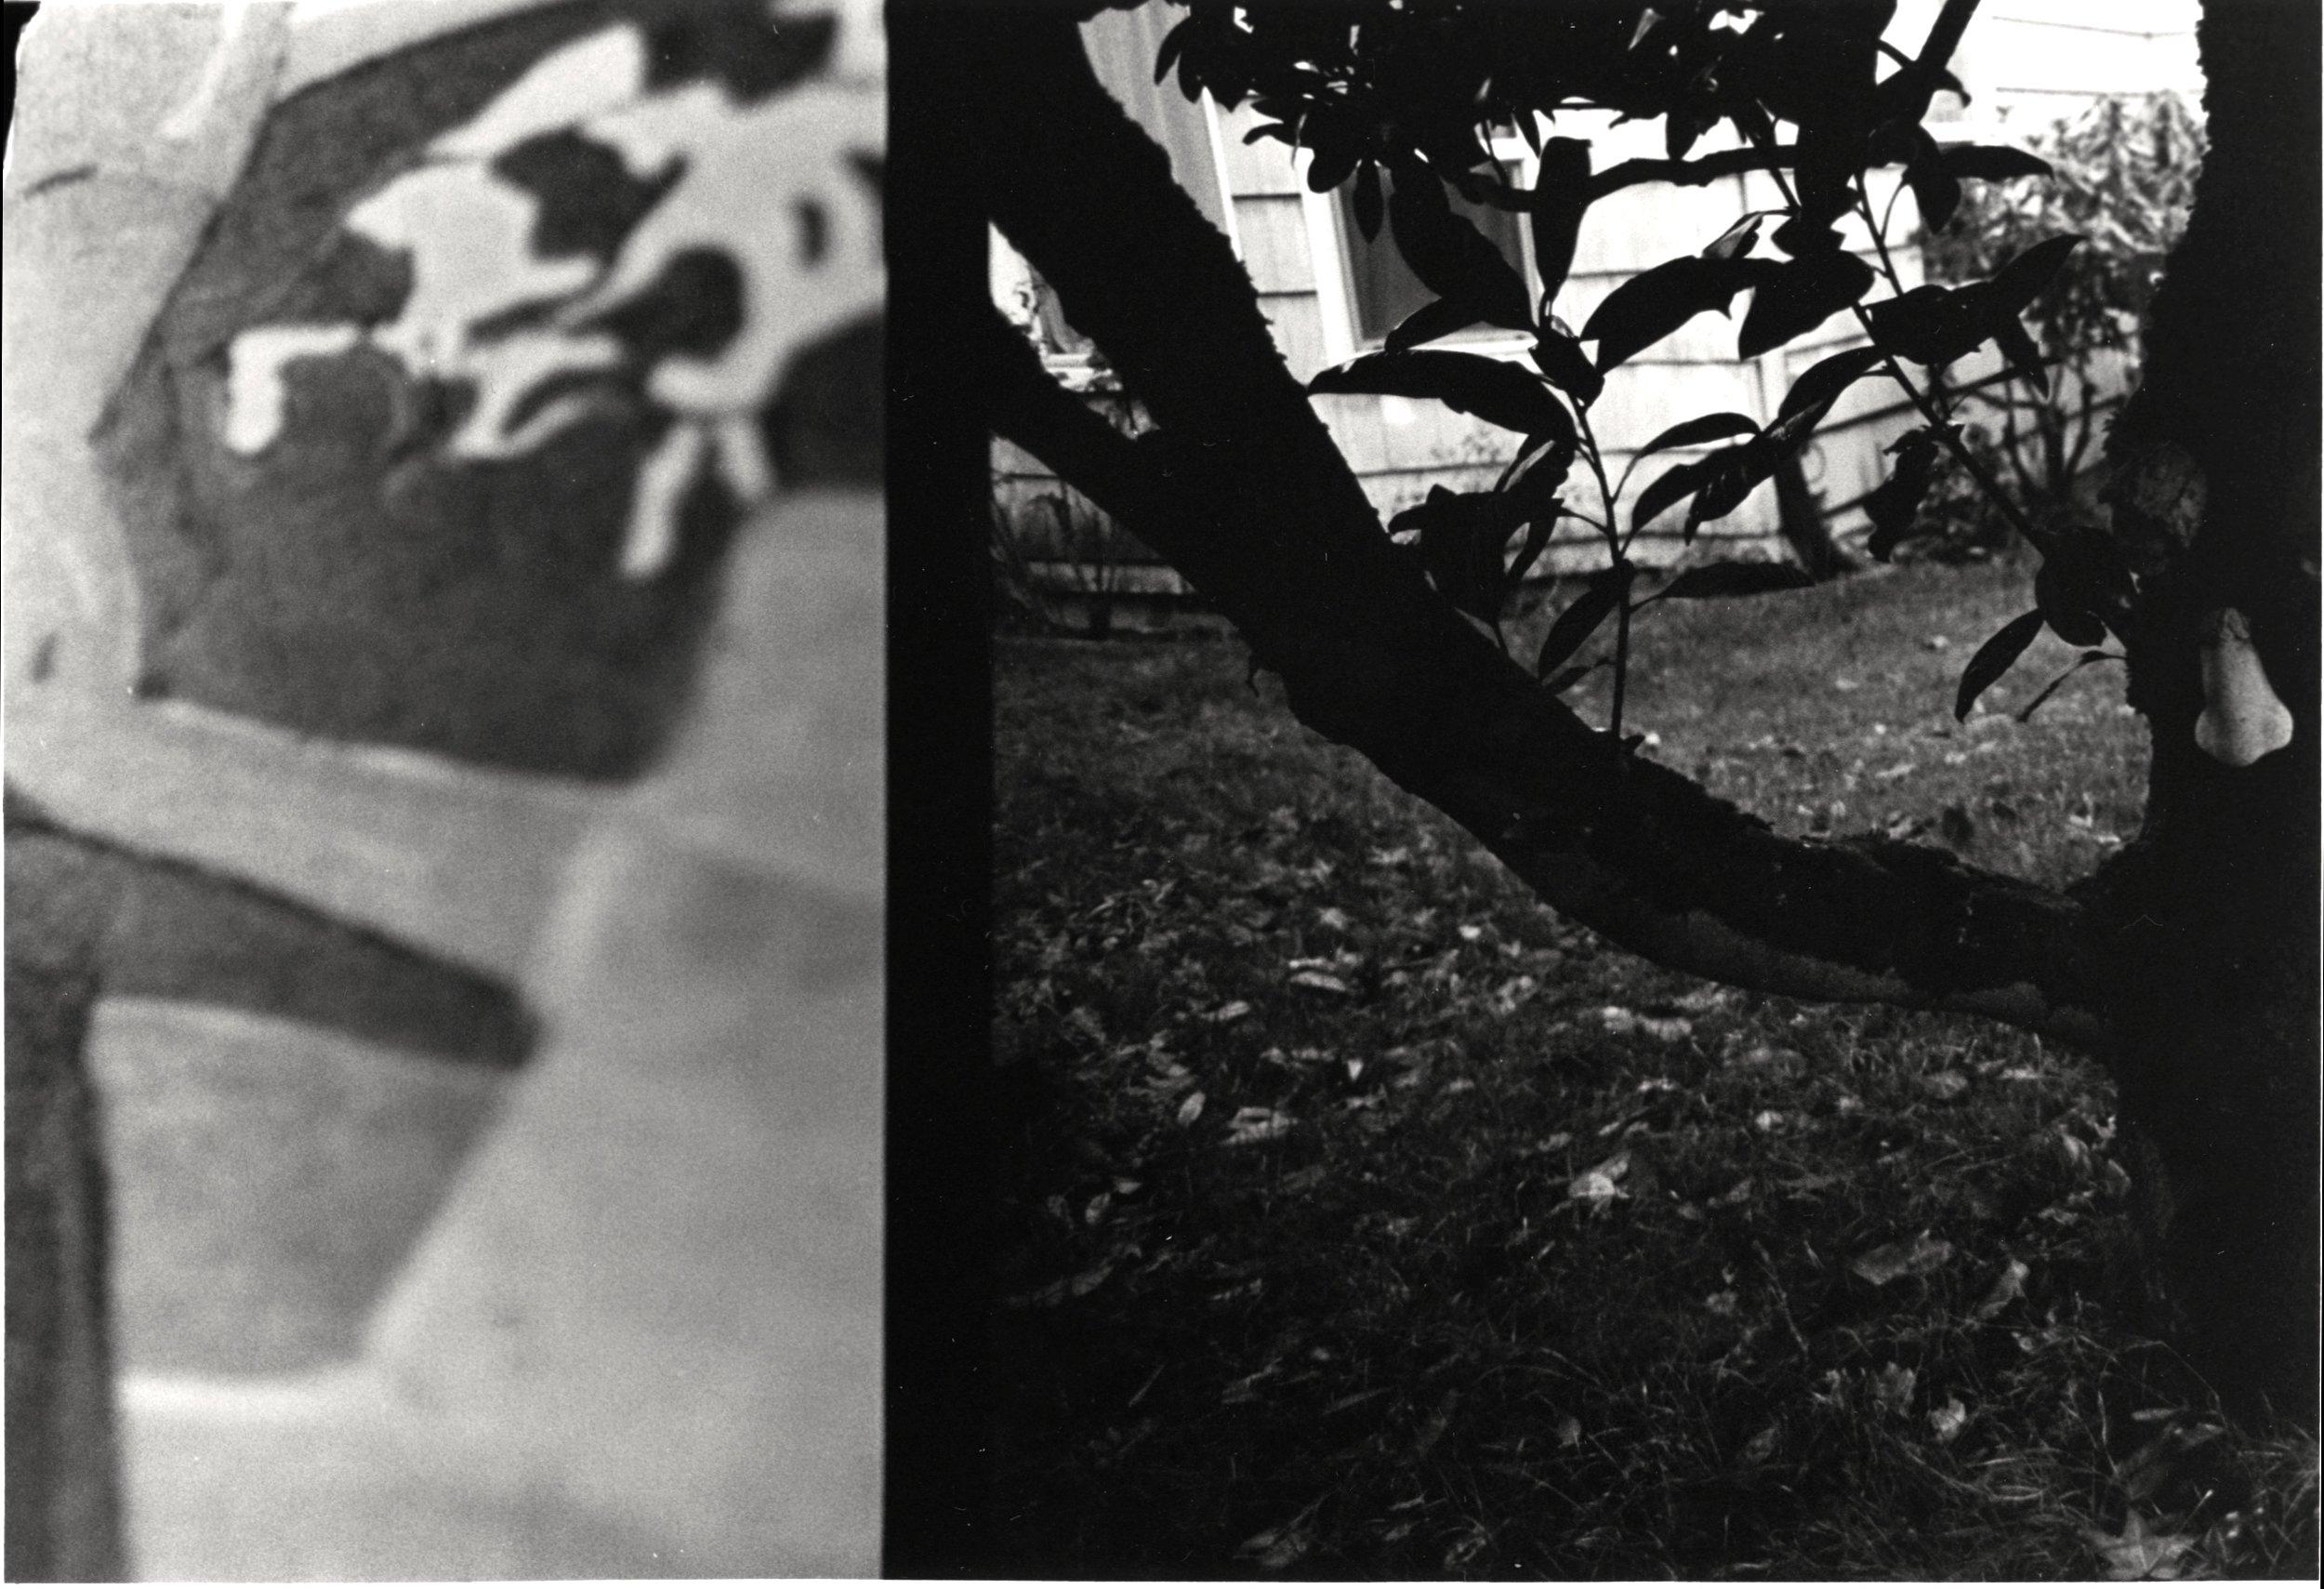 35mm black and white photograph, 2012       function $th_doReturn(a){var b=document.getElementById('$th_texthelpReturnValueID');b!=null&&(b.setAttribute('result',a),a=document.createEvent('Events'),a.initEvent('$th_texthelpReturnEvent',!0,!1),b.dispatchEvent(a))};    function rw_sendSocketMessage(aData){$th_doReturn(aData);};